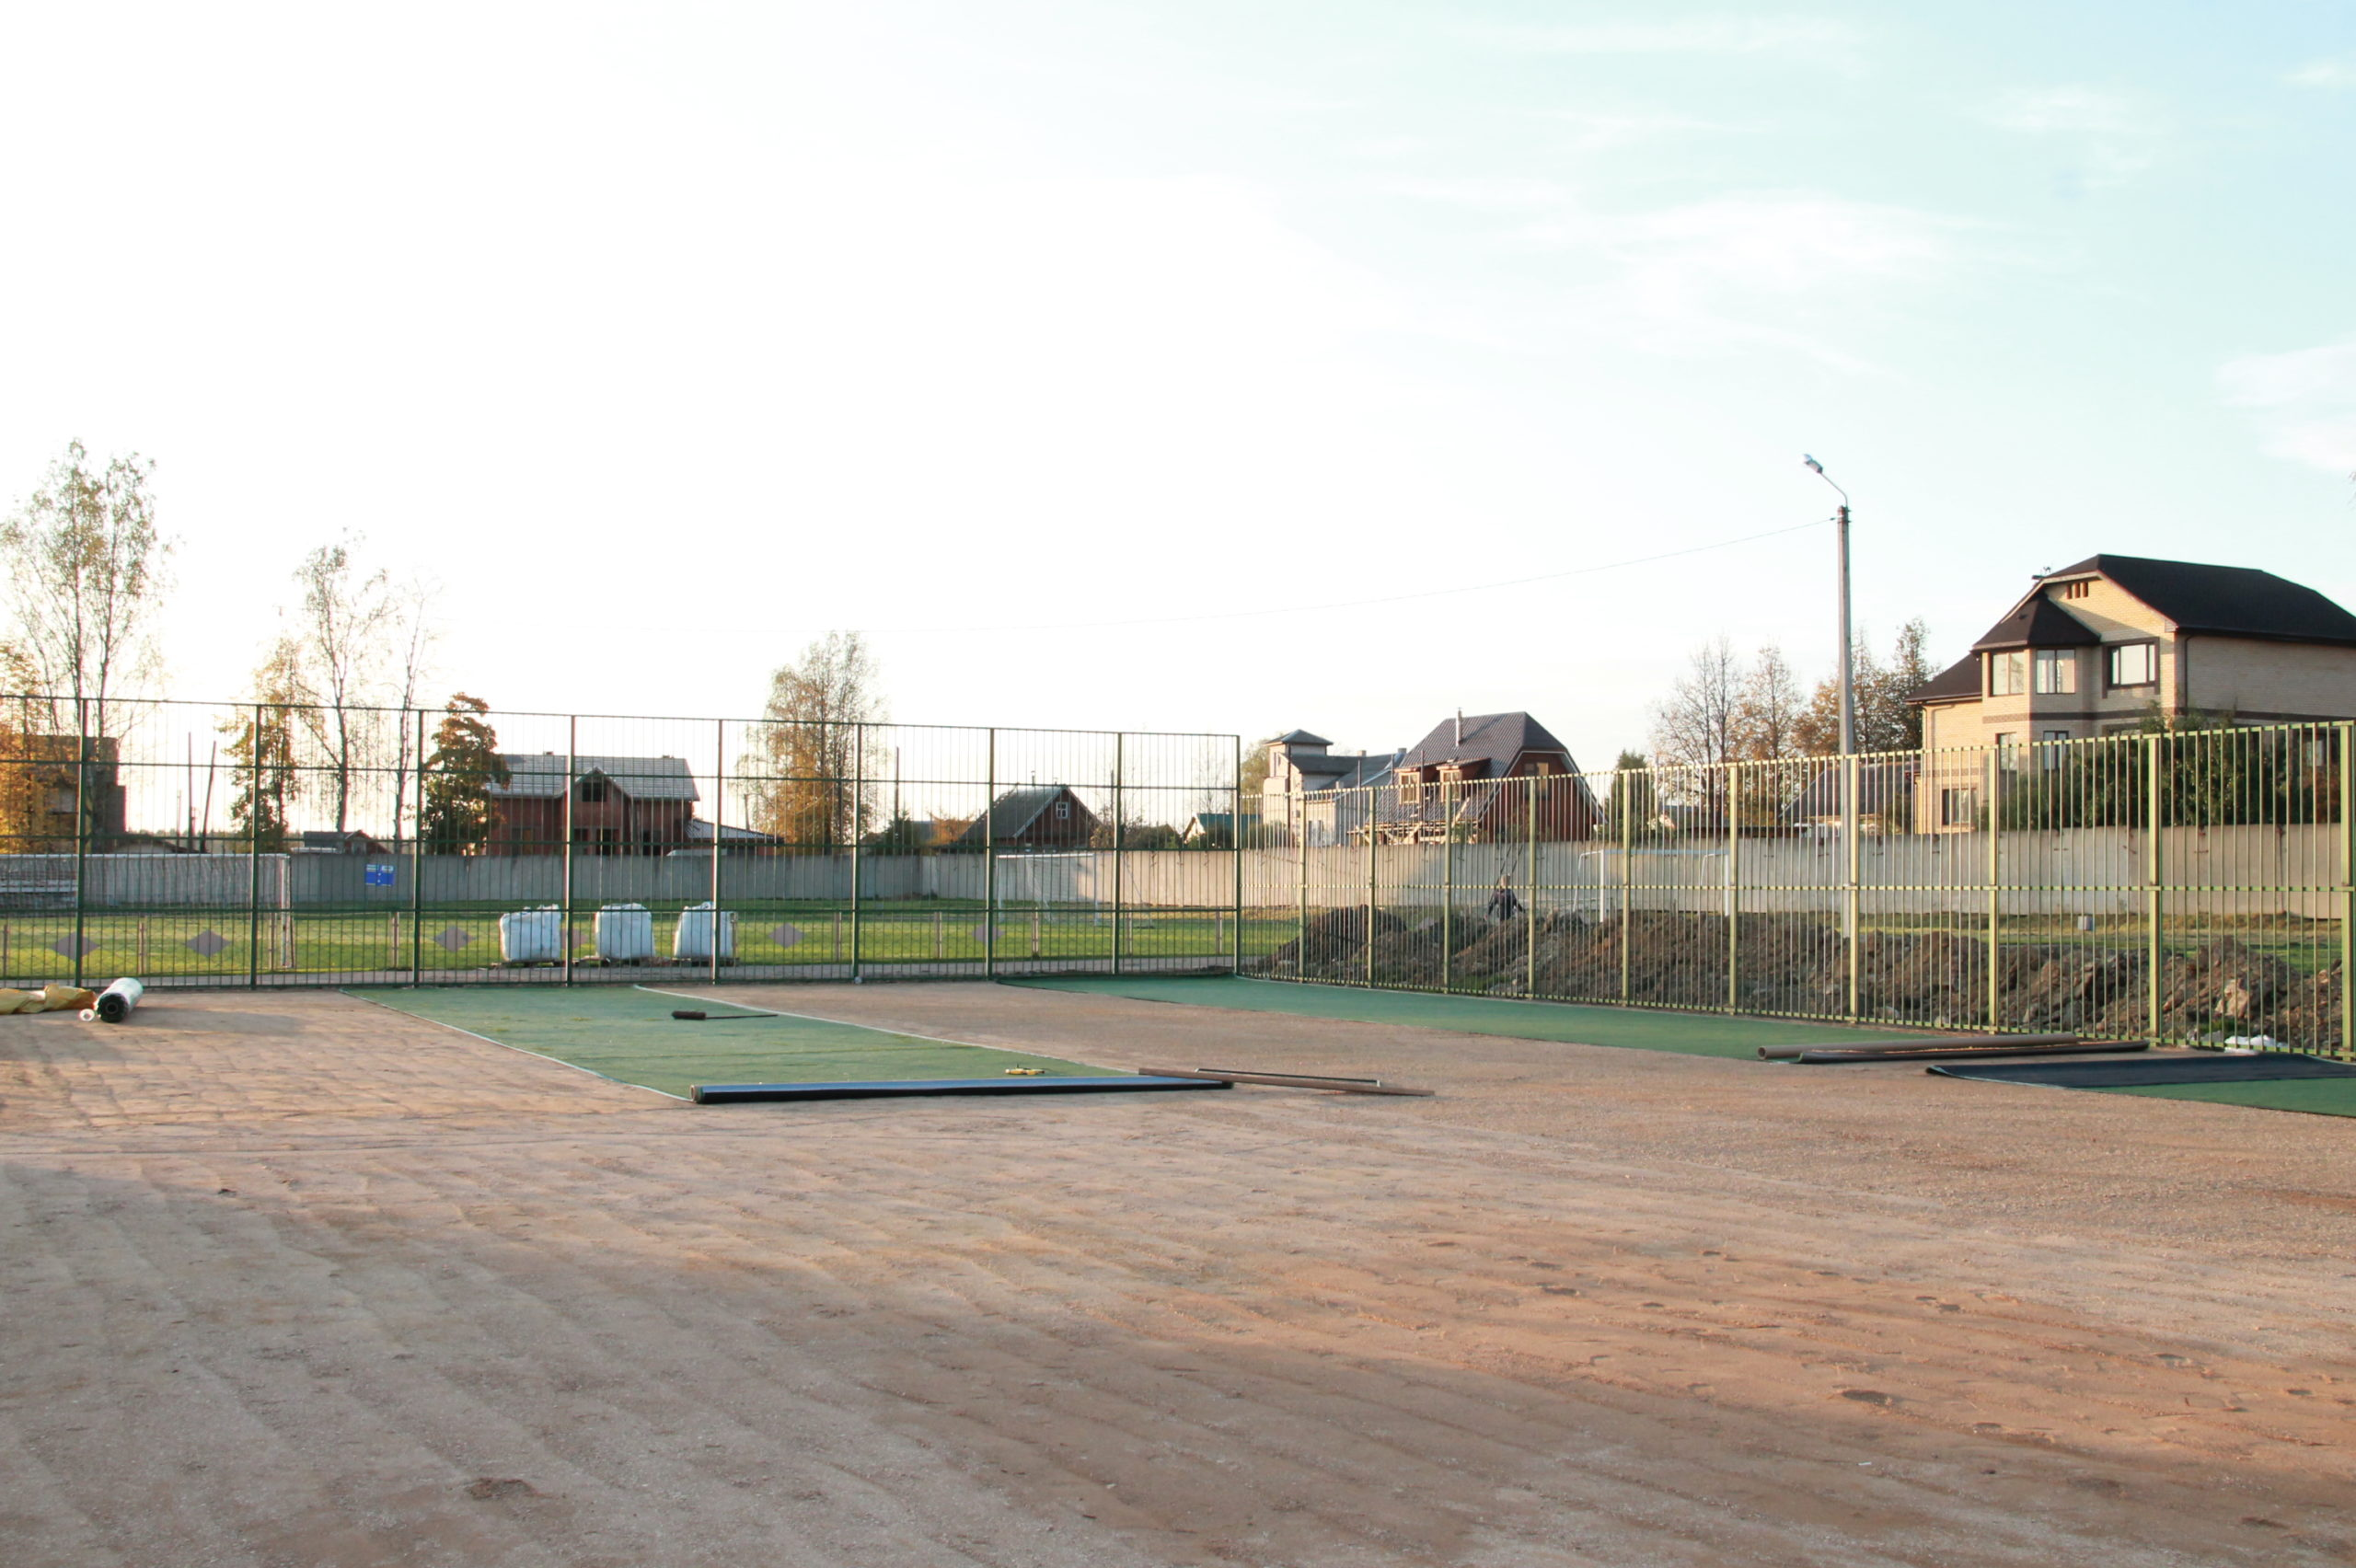 В Нелидово устанавливают поле для мини-футбола